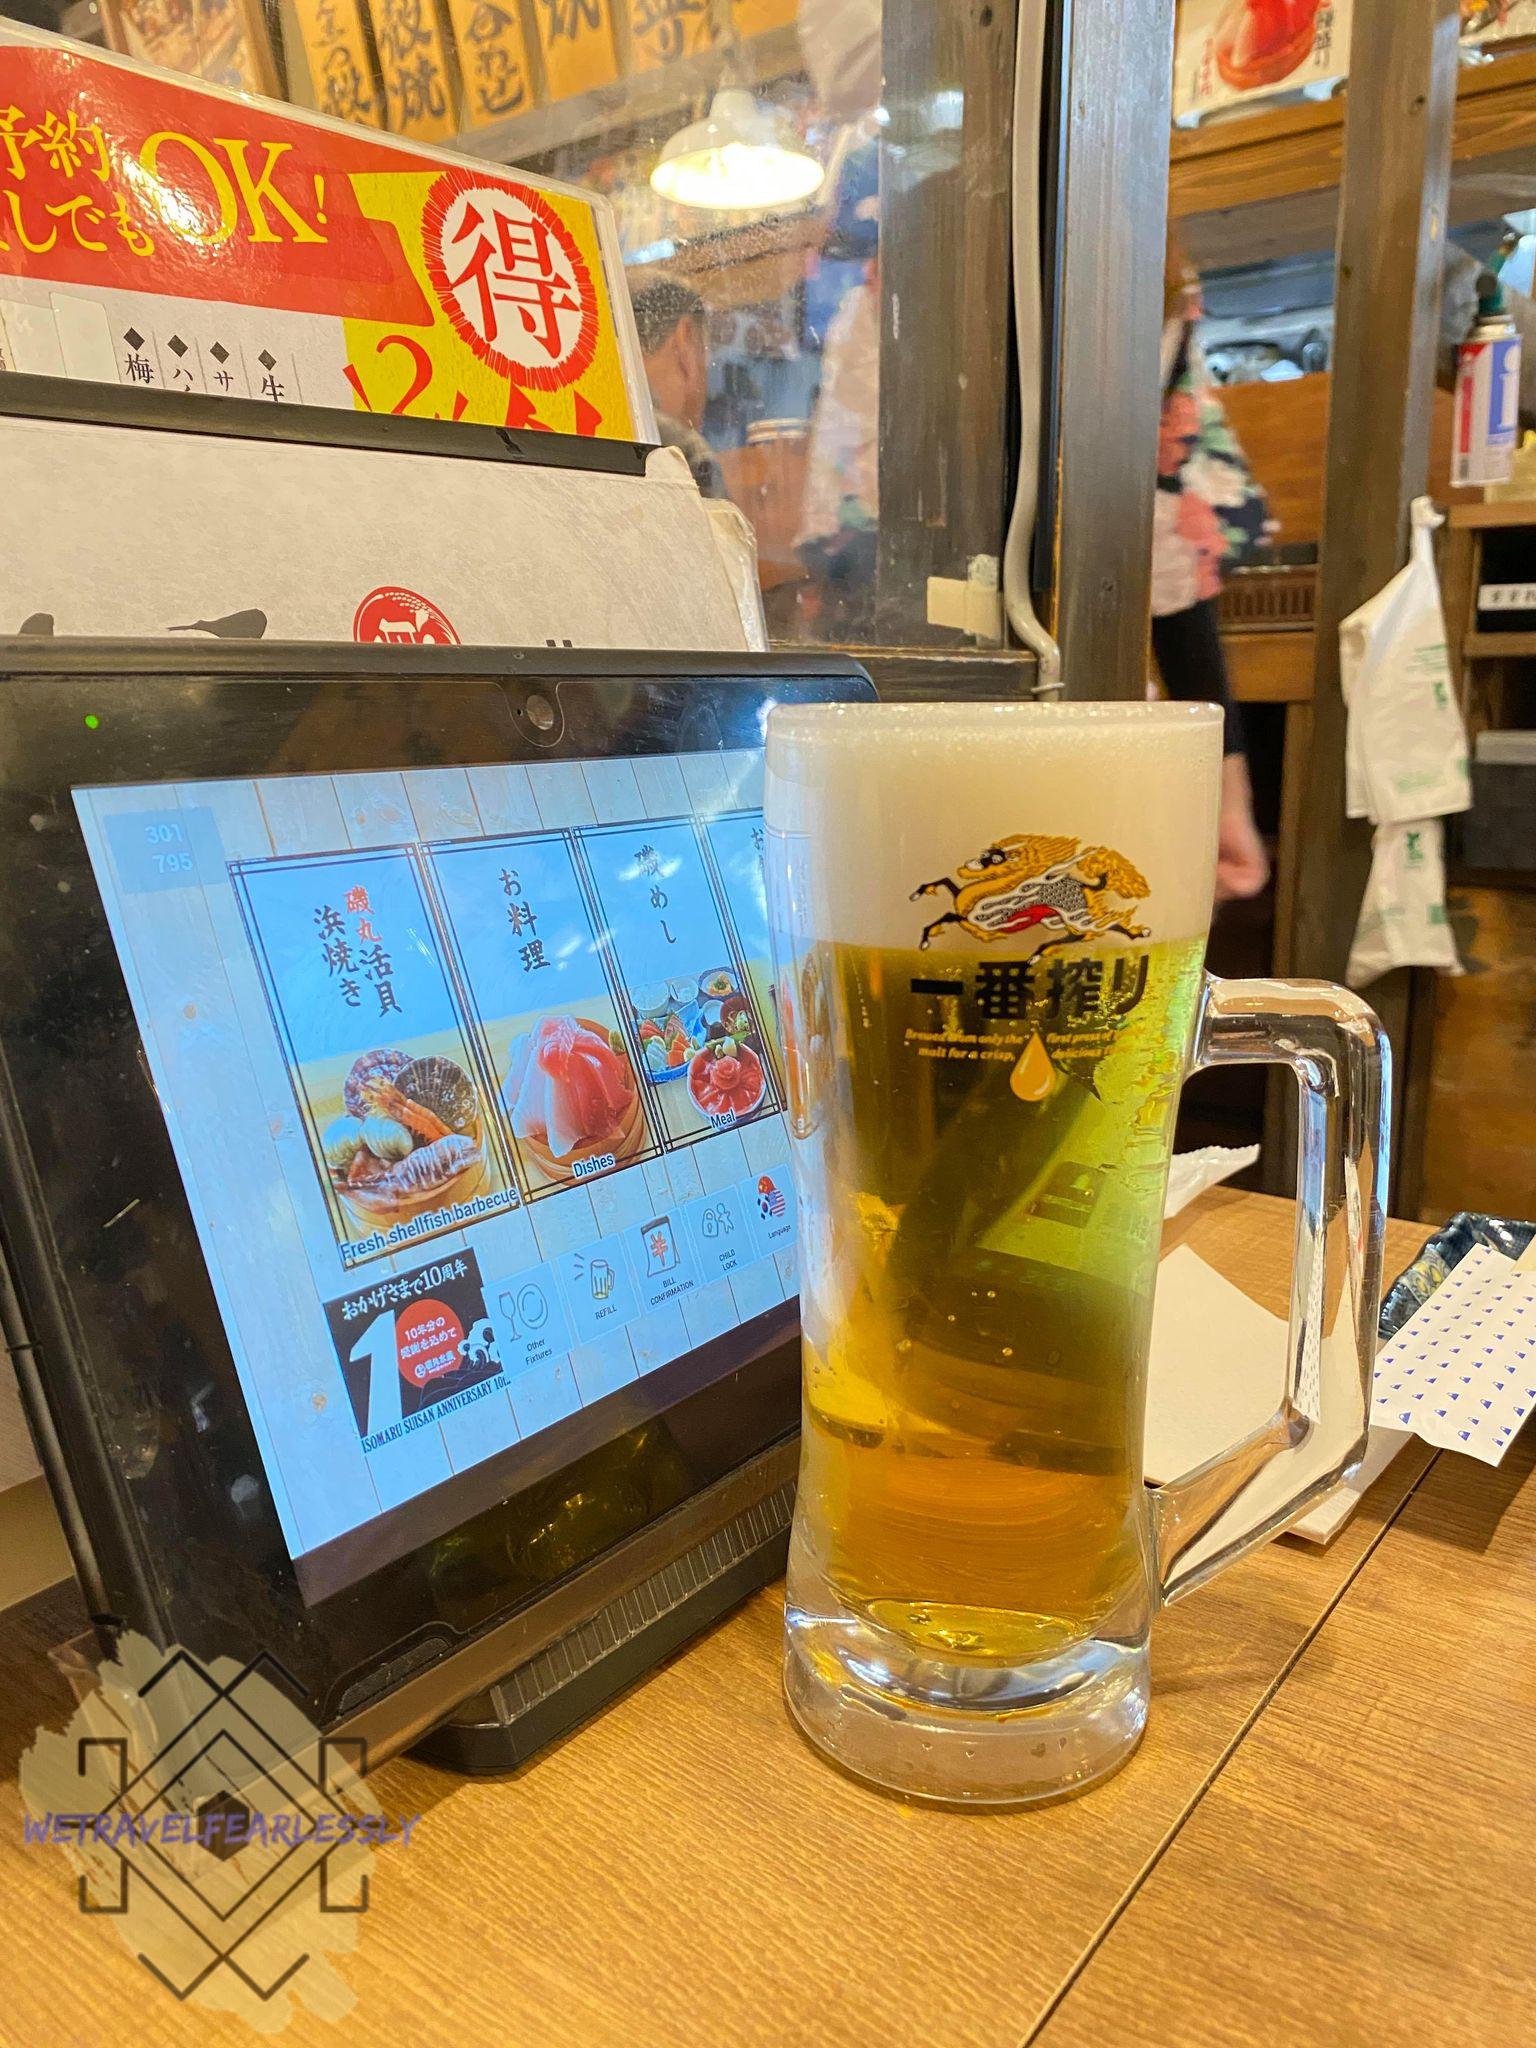 Isomaru Suisan in Yokohama - WTF Food Review